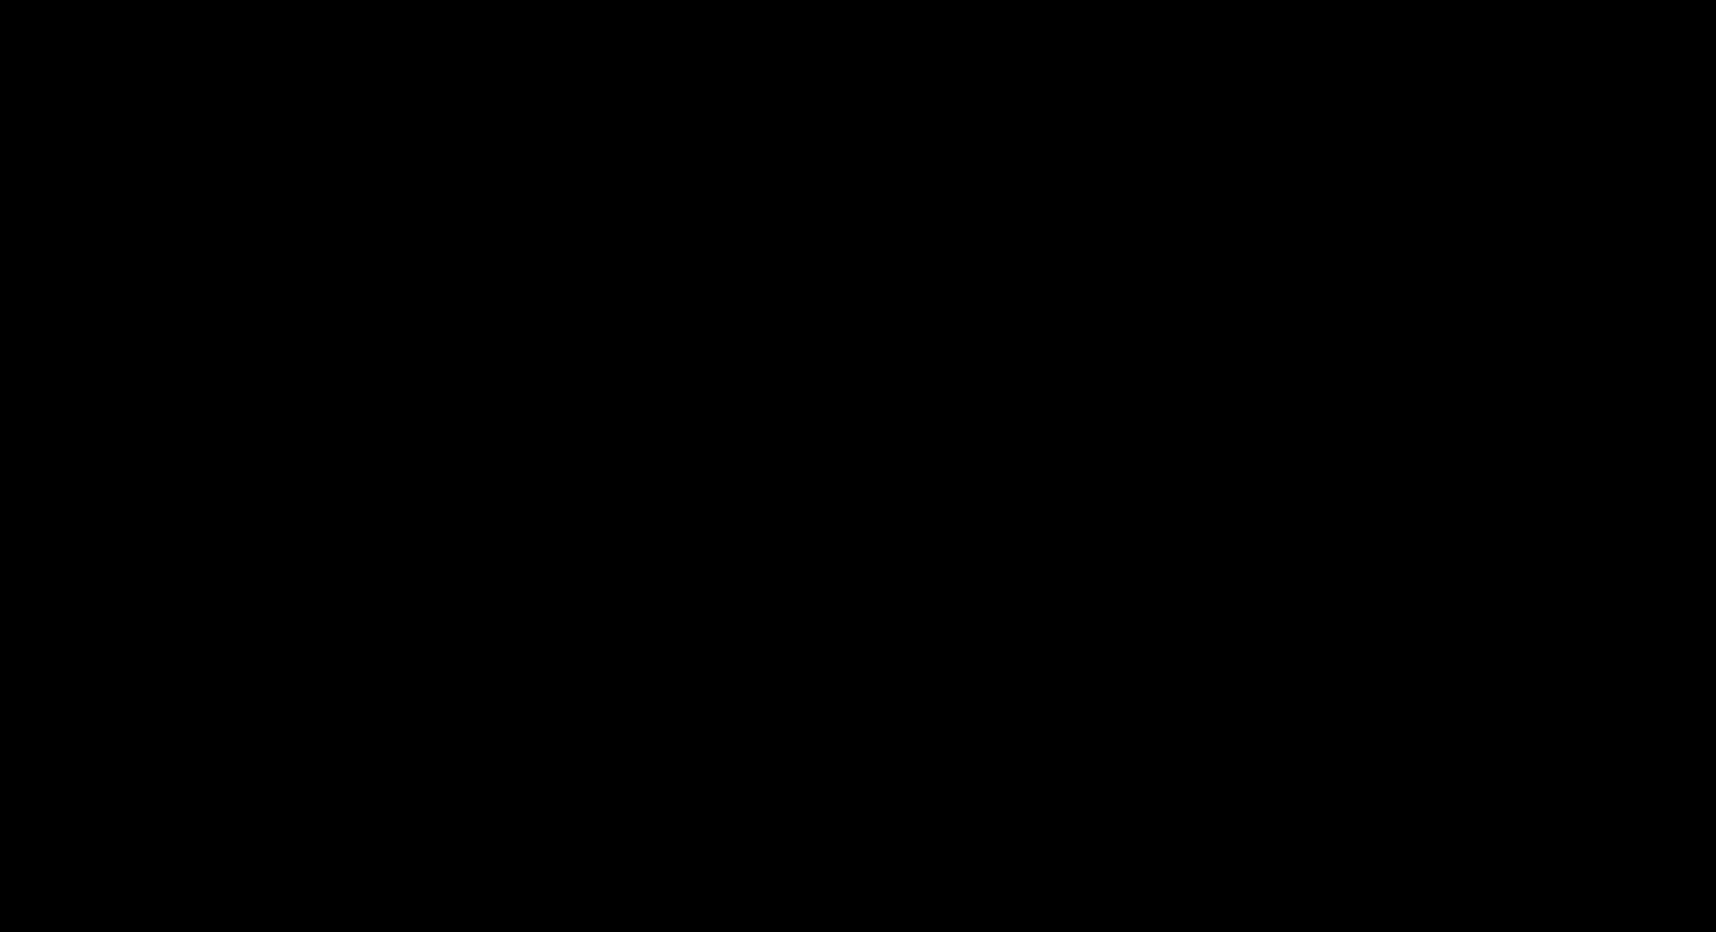 Dansyl-<sup>13</sup>C<sub>2</sub>-cadaverine